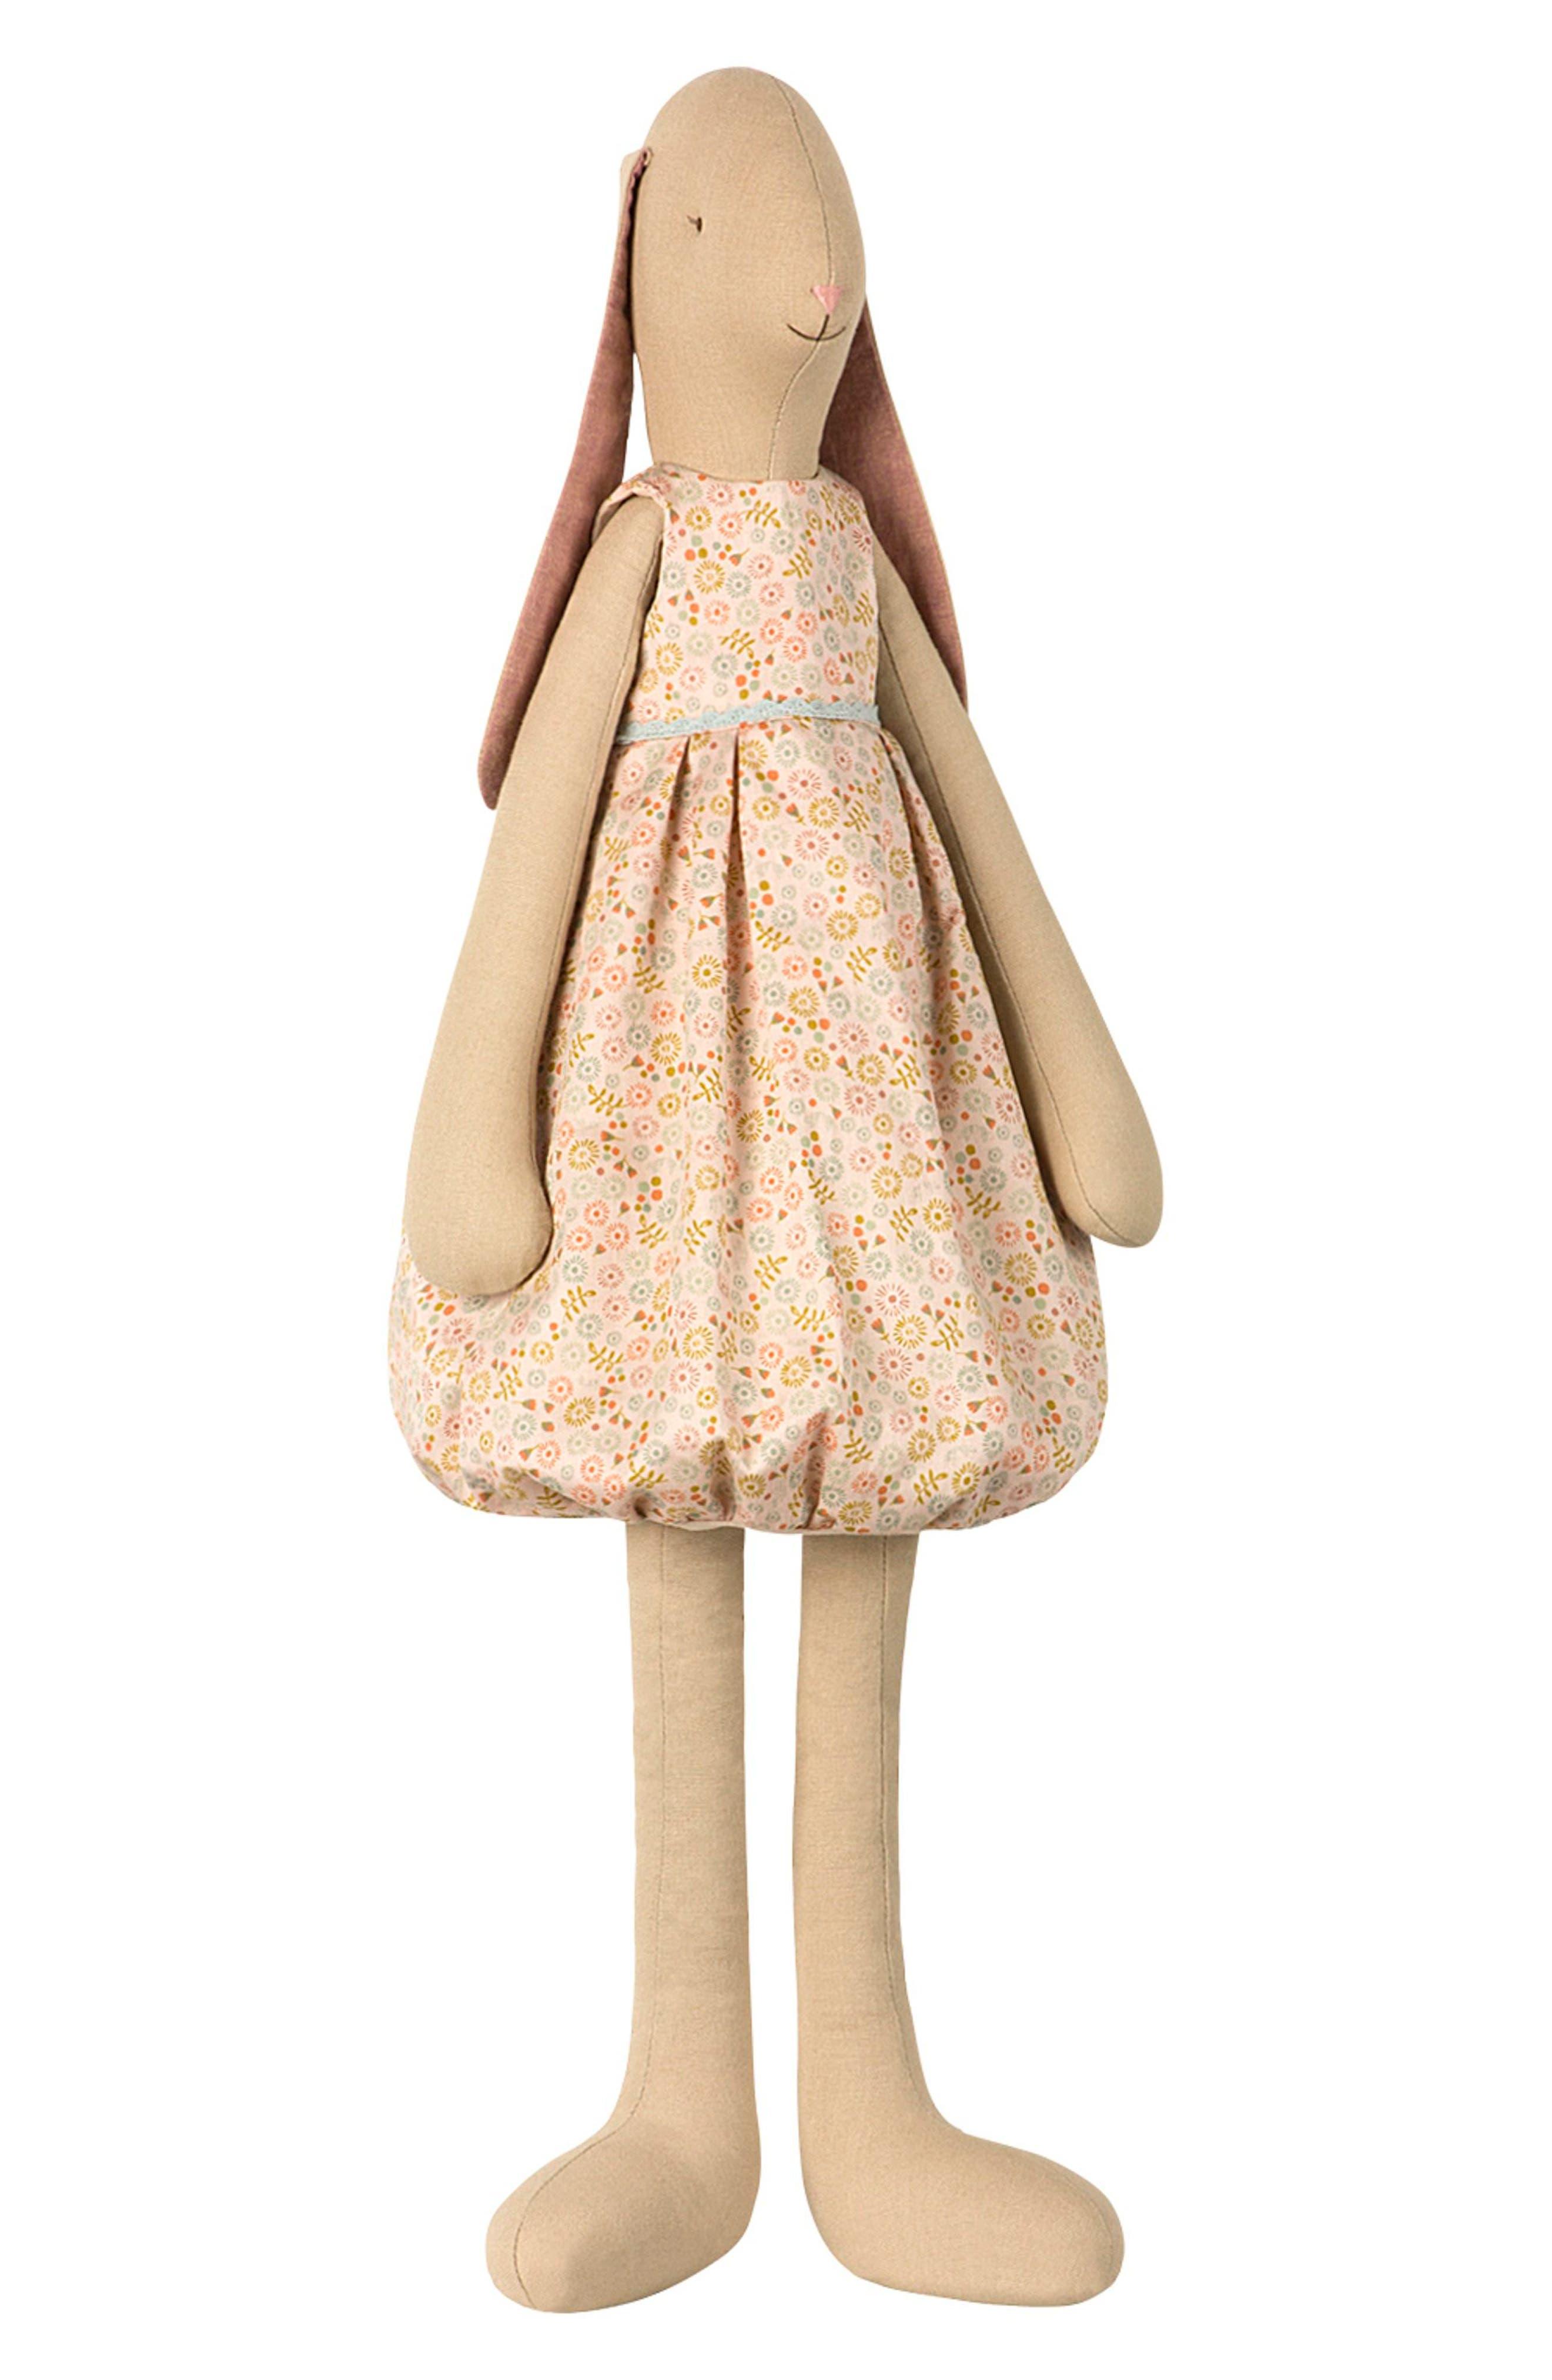 Daisy Mega Vanilla Bunny Stuffed Animal,                         Main,                         color, PEACHE FLORAL DRESS